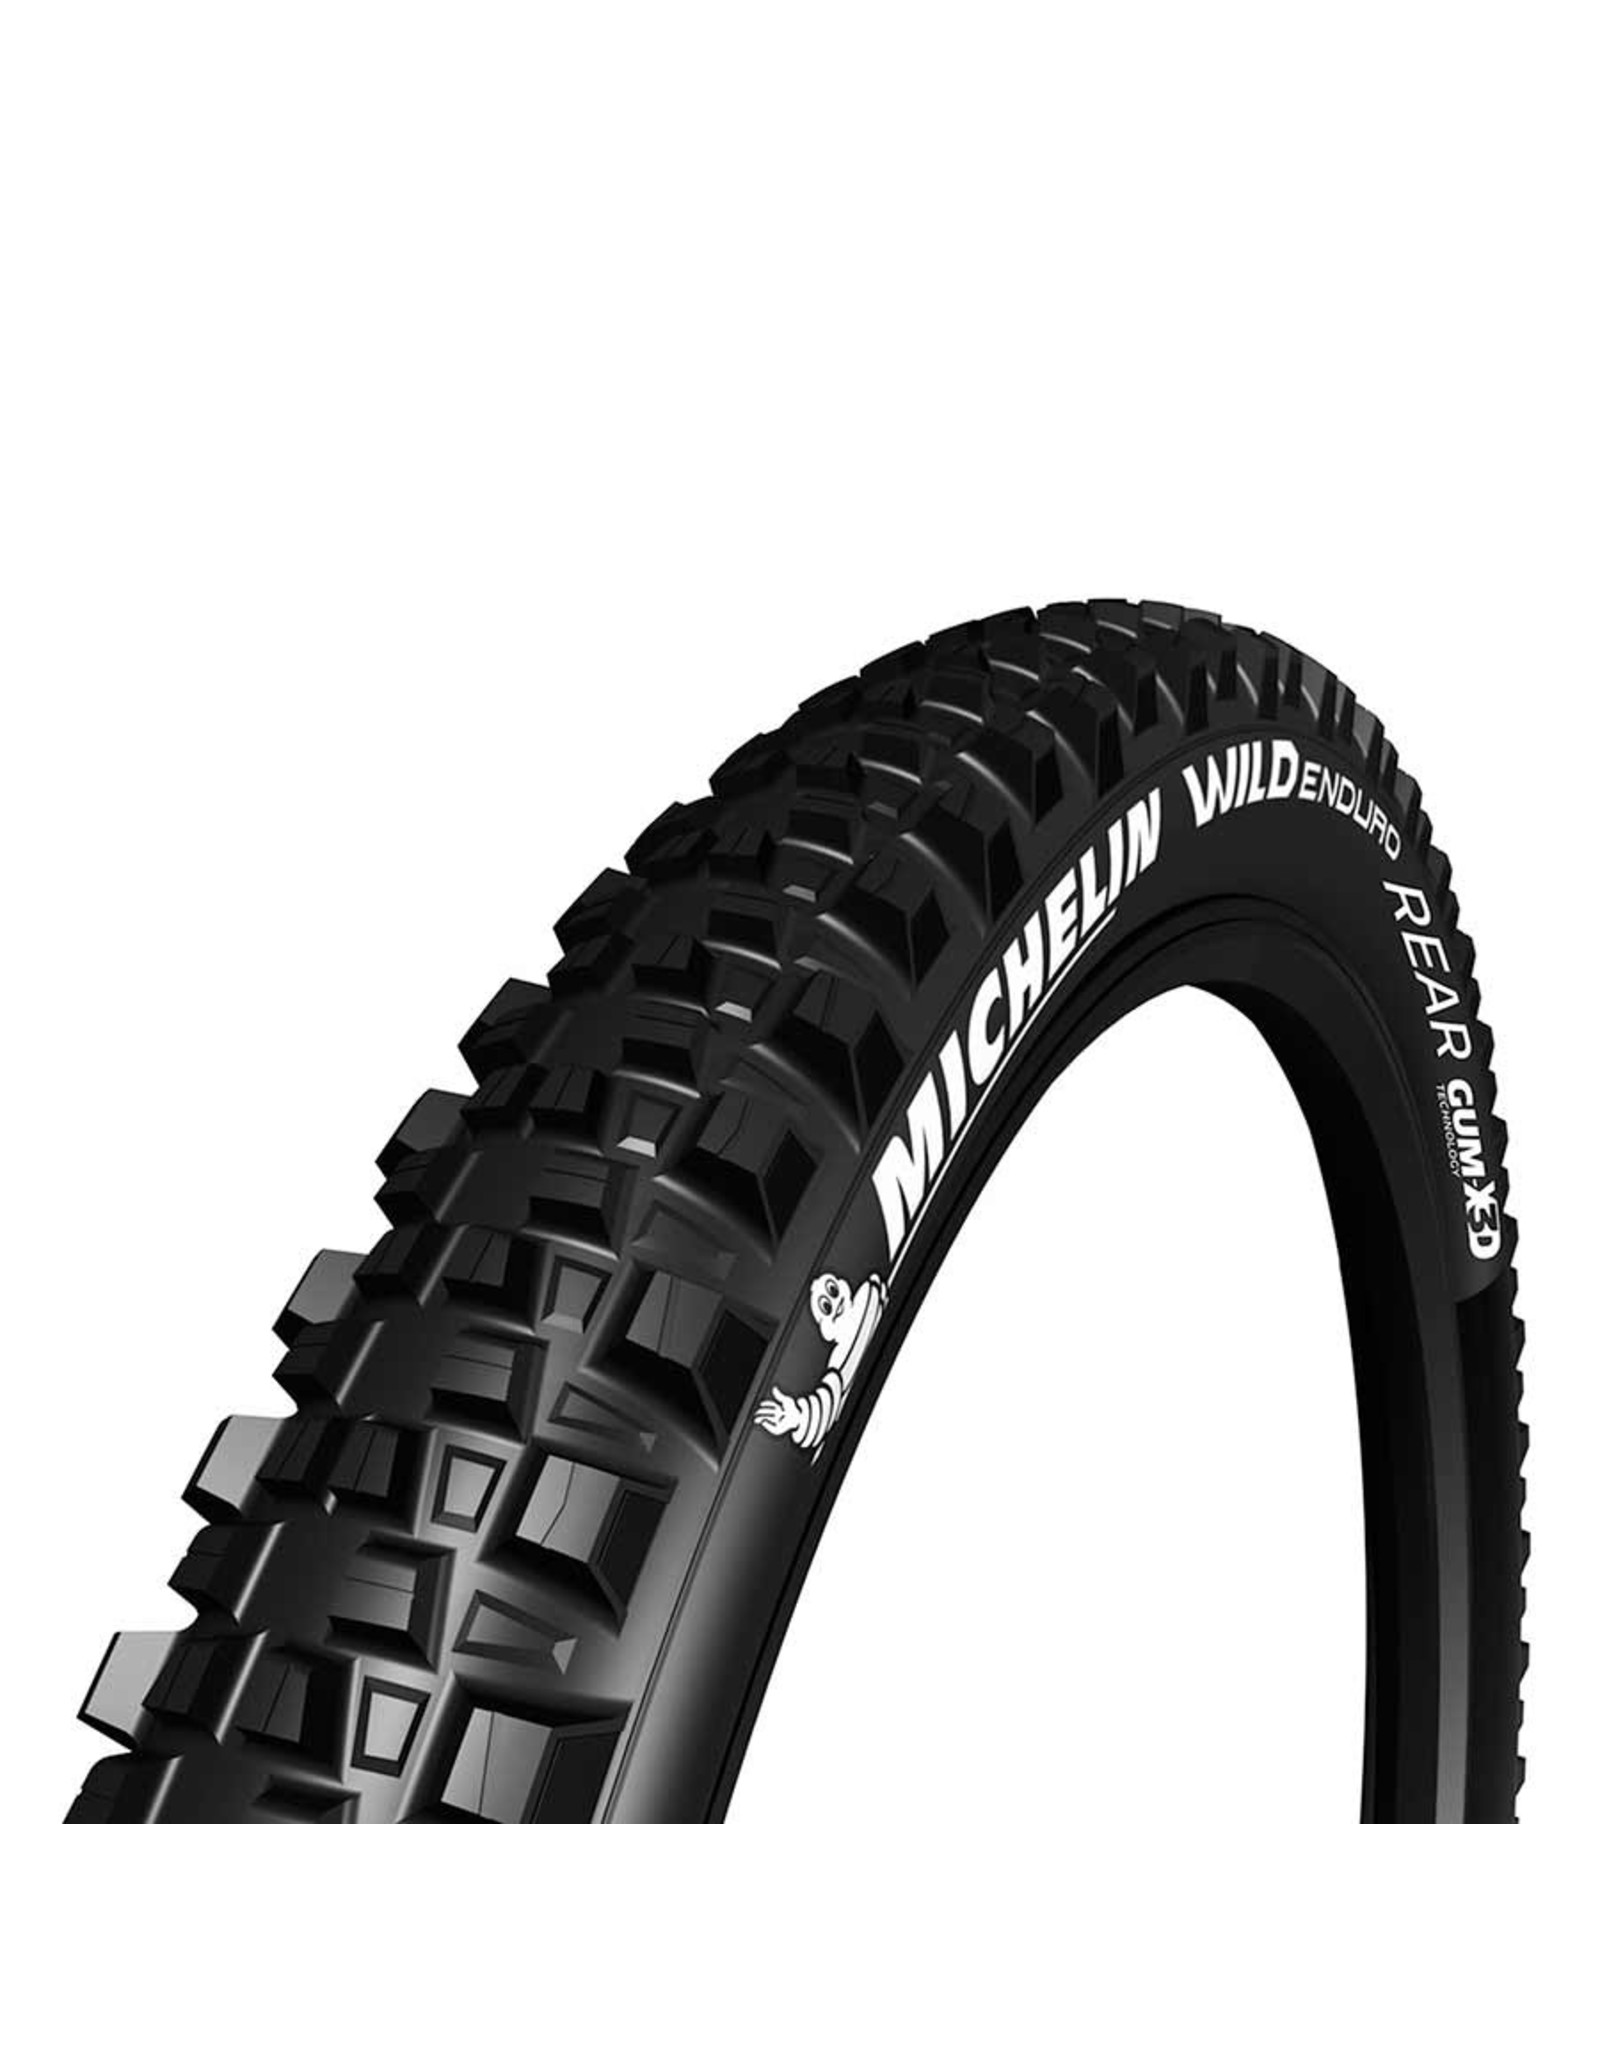 Michelin Michelin, Wild Enduro Front, Tire, 29''x2.40, Folding, Tubeless Ready, MAGI-X, GravityShield, 60TPI, Black